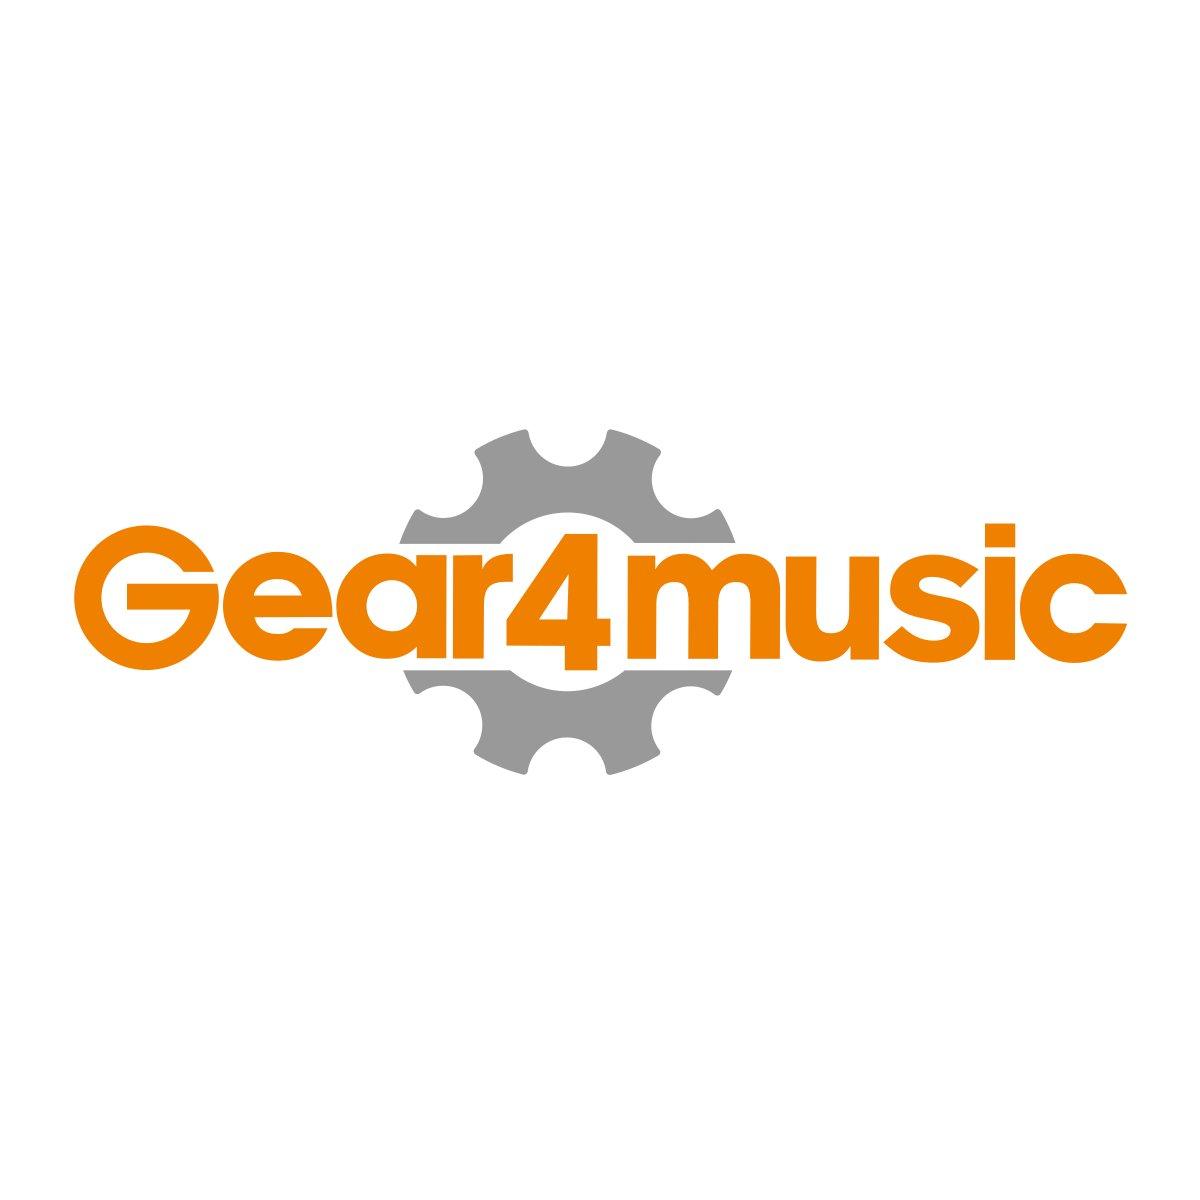 "19"" 12U + 10U Adjustable Studio Rack Trolley by Gear4music"